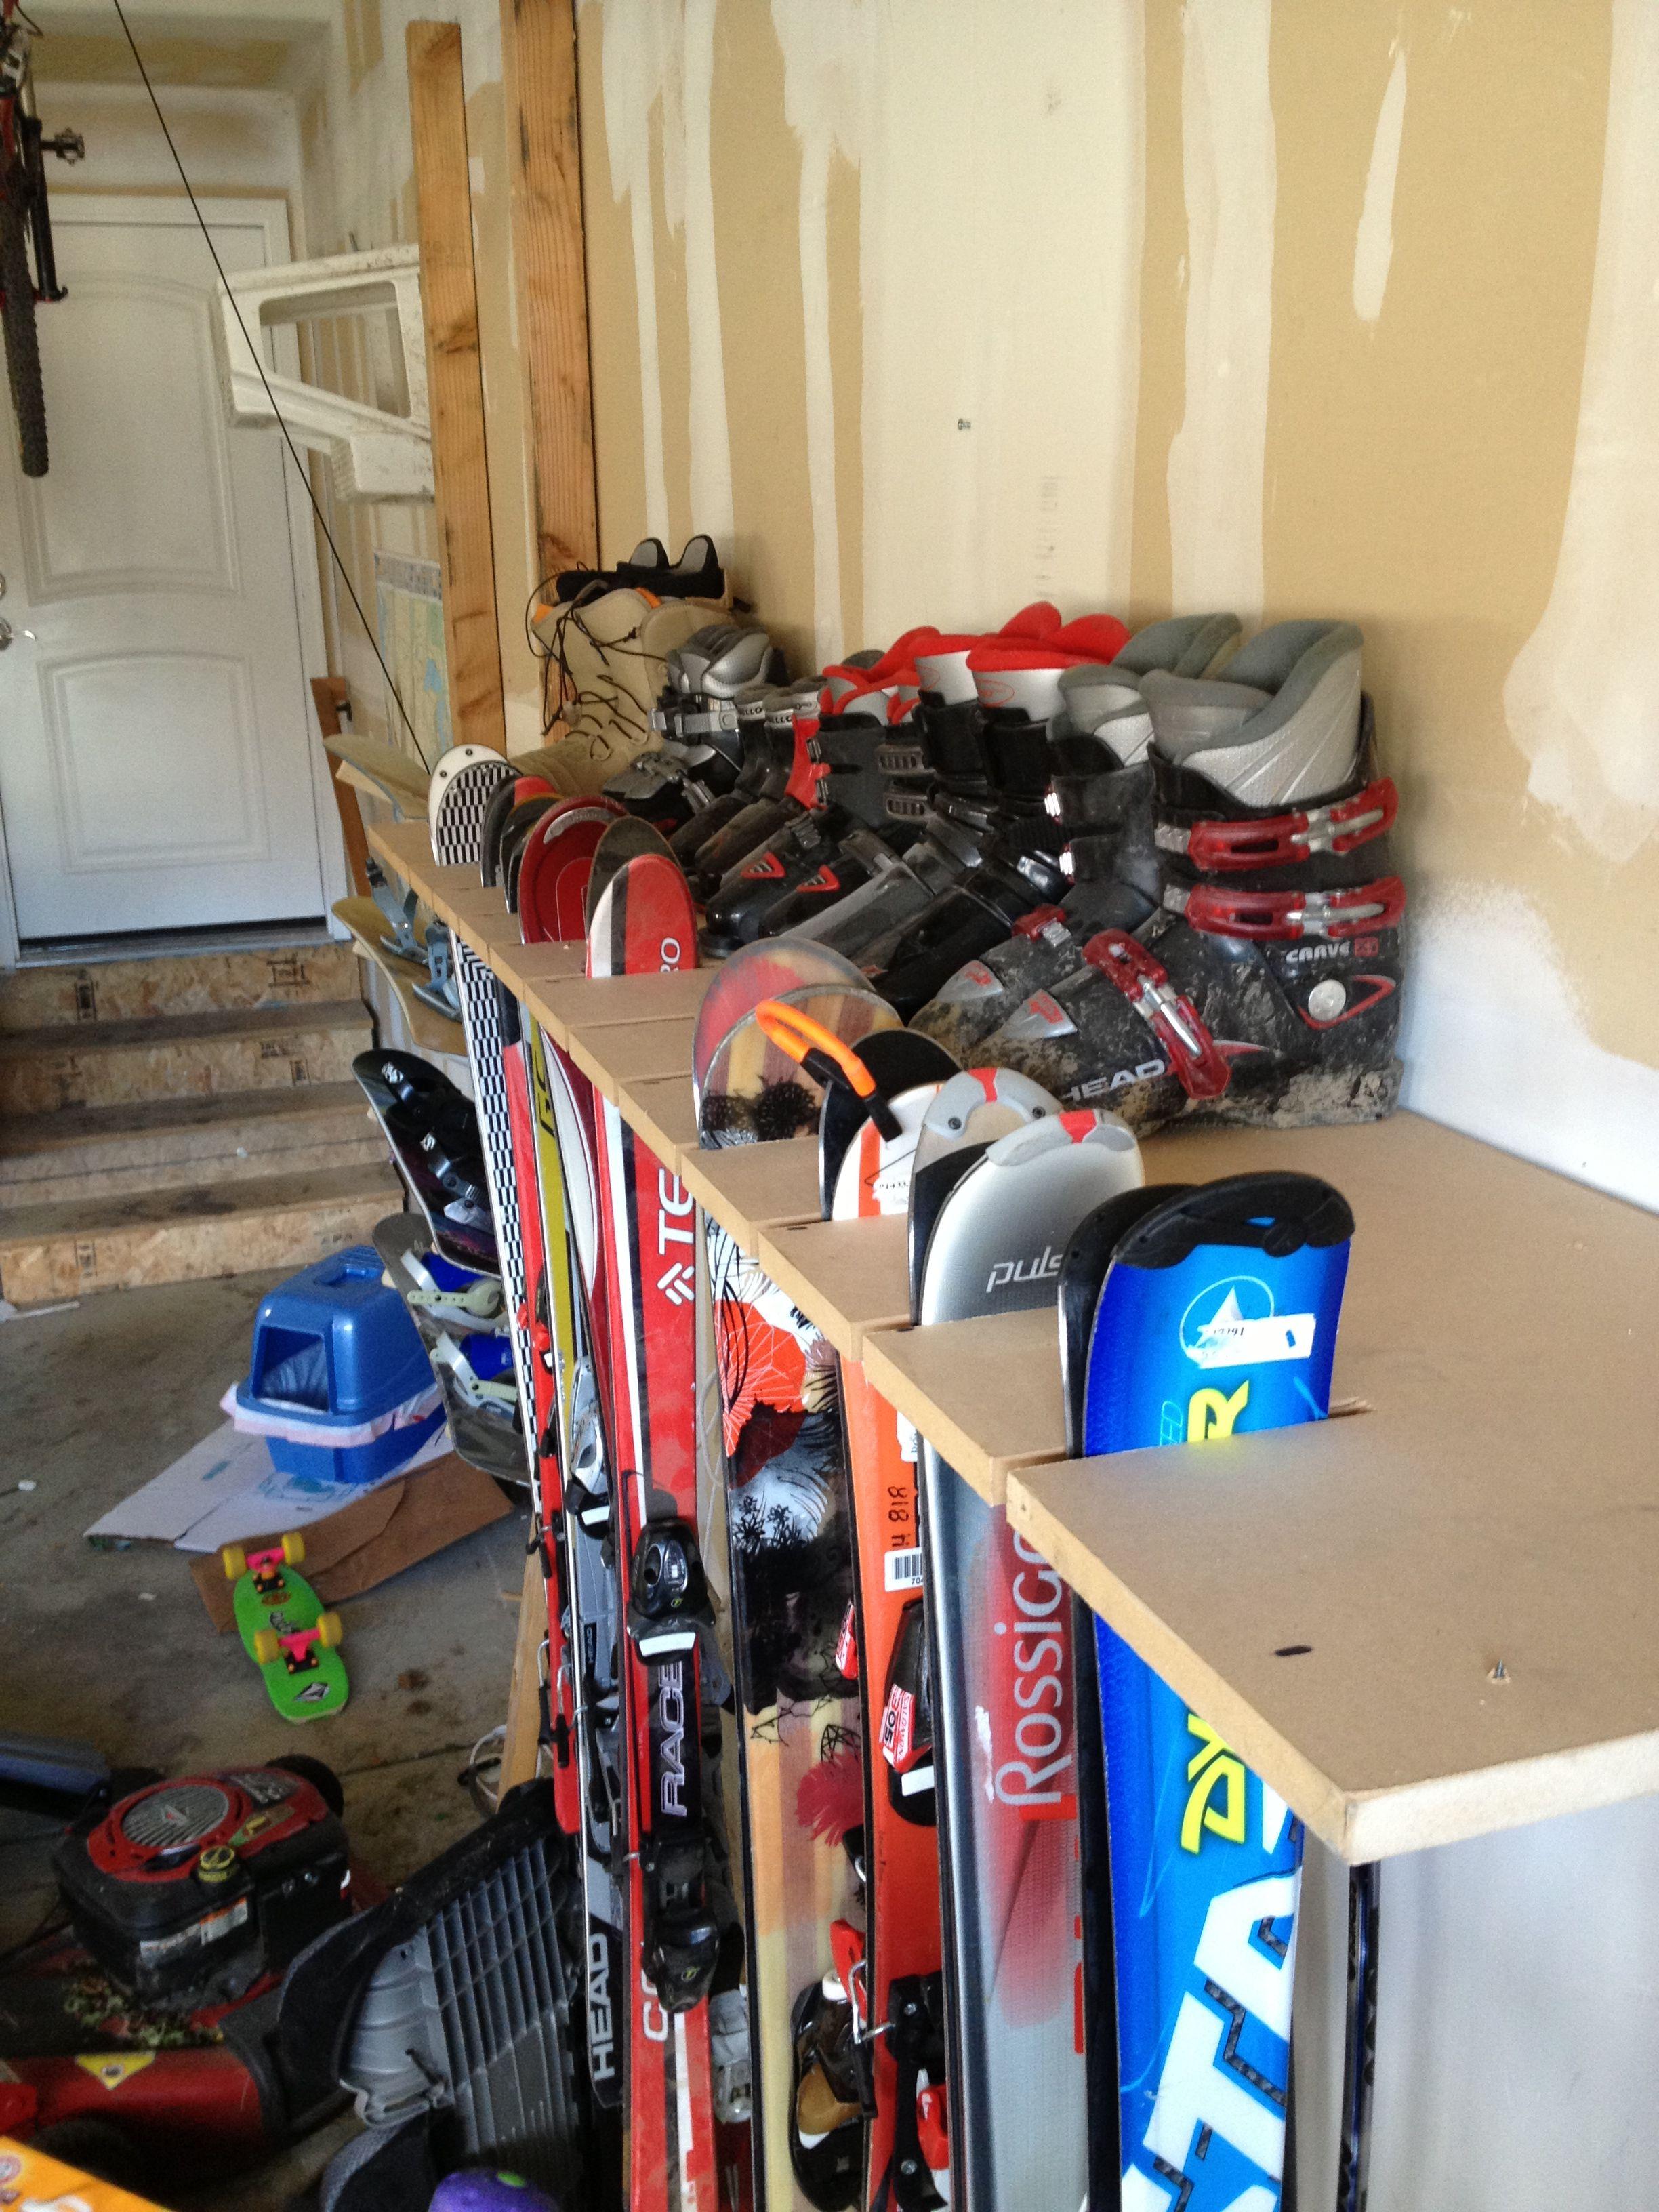 Garage Organization Skis   Google Search. Garage OrganizationGarage  StorageStorage RackStorage IdeasOrganizingSki ...